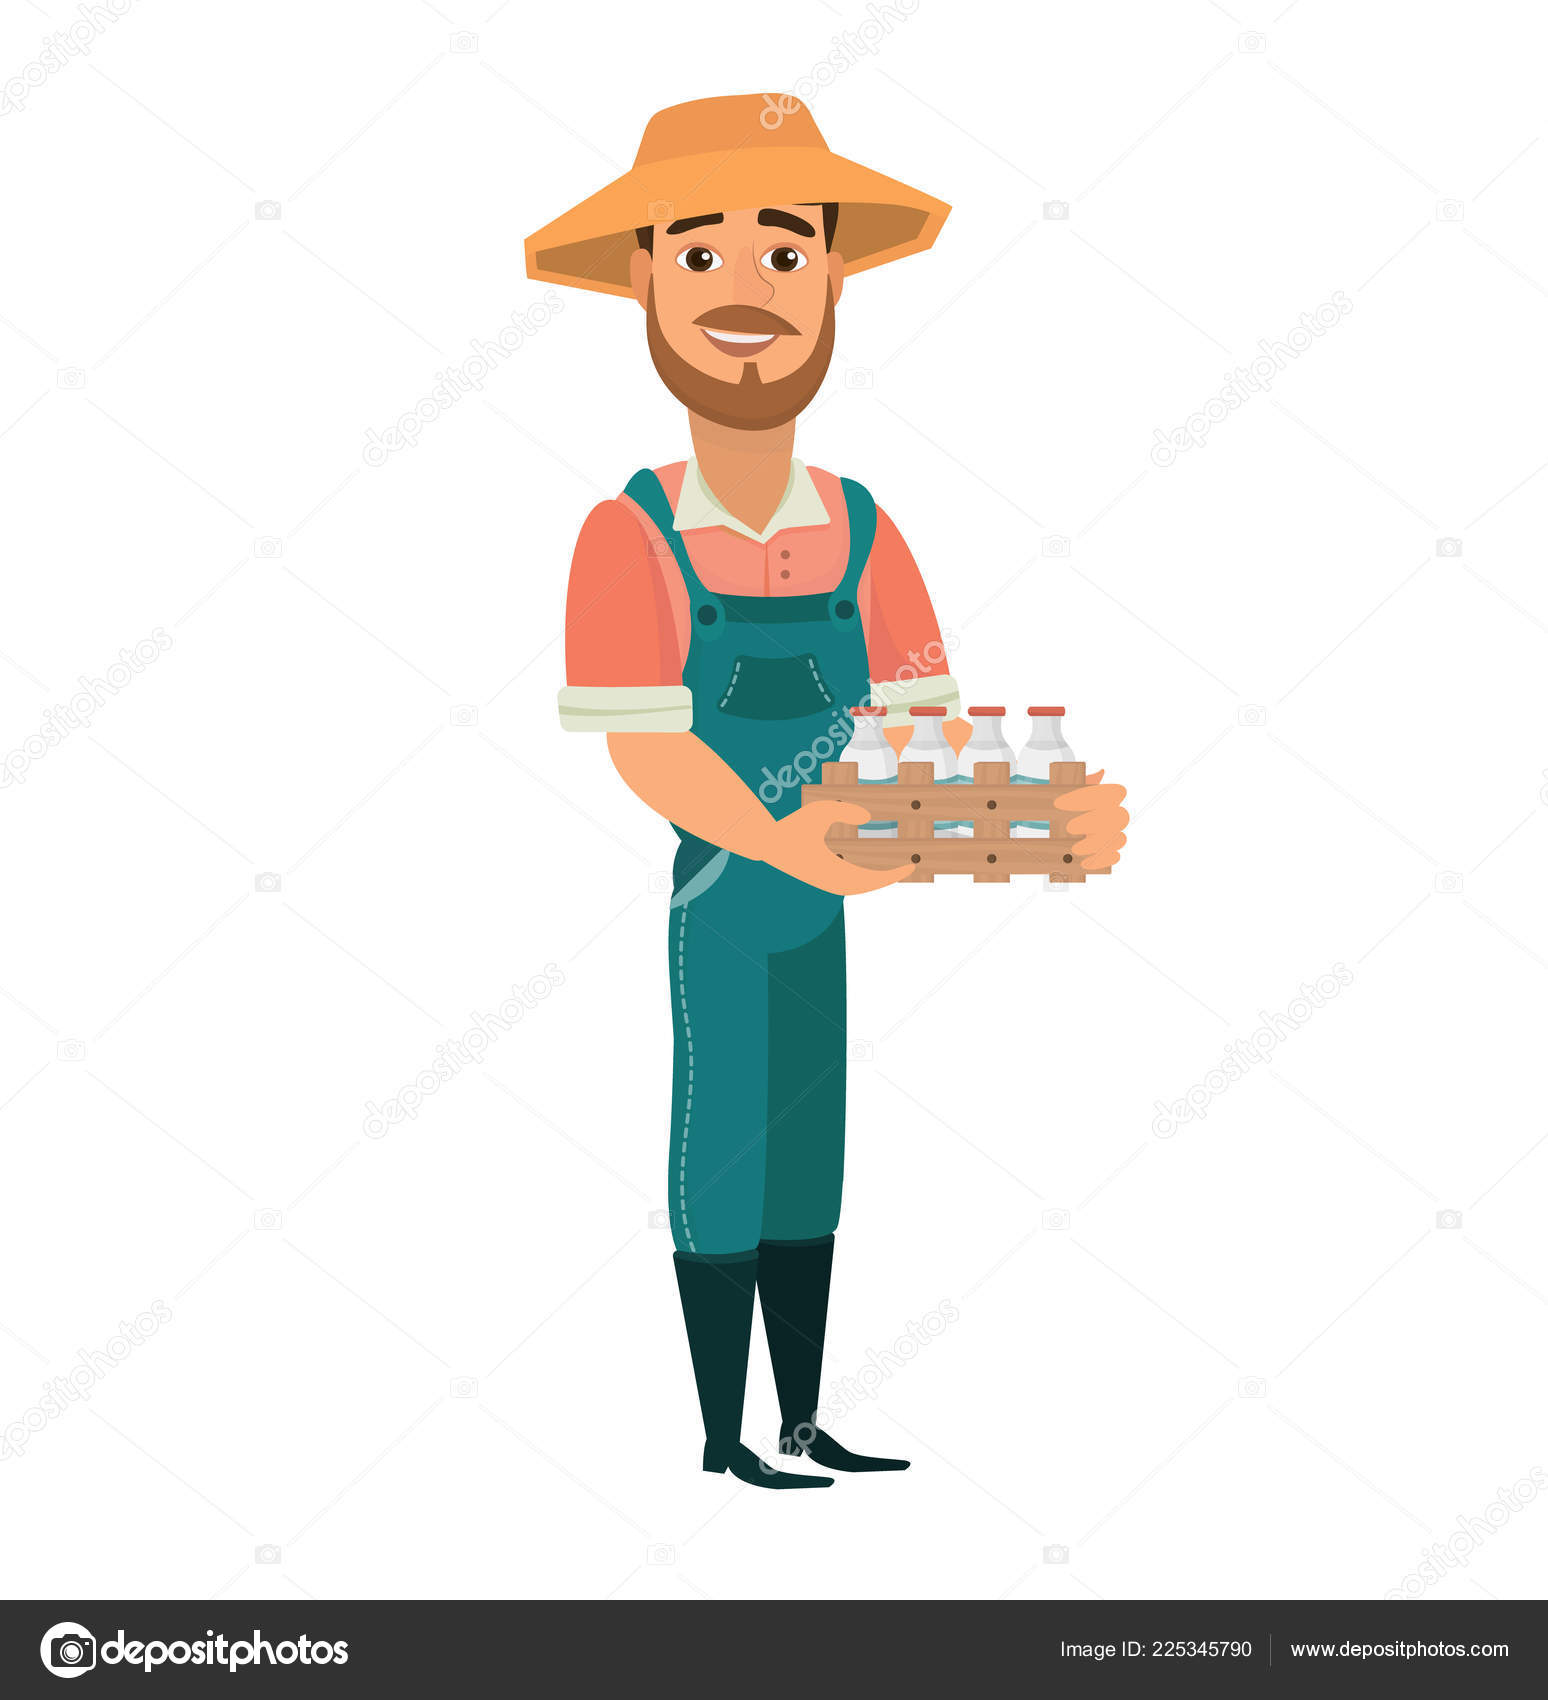 de45eaa47e4f Cartoon Farmer Cheerful Bearded Man Farm Worker Character Dressed ...